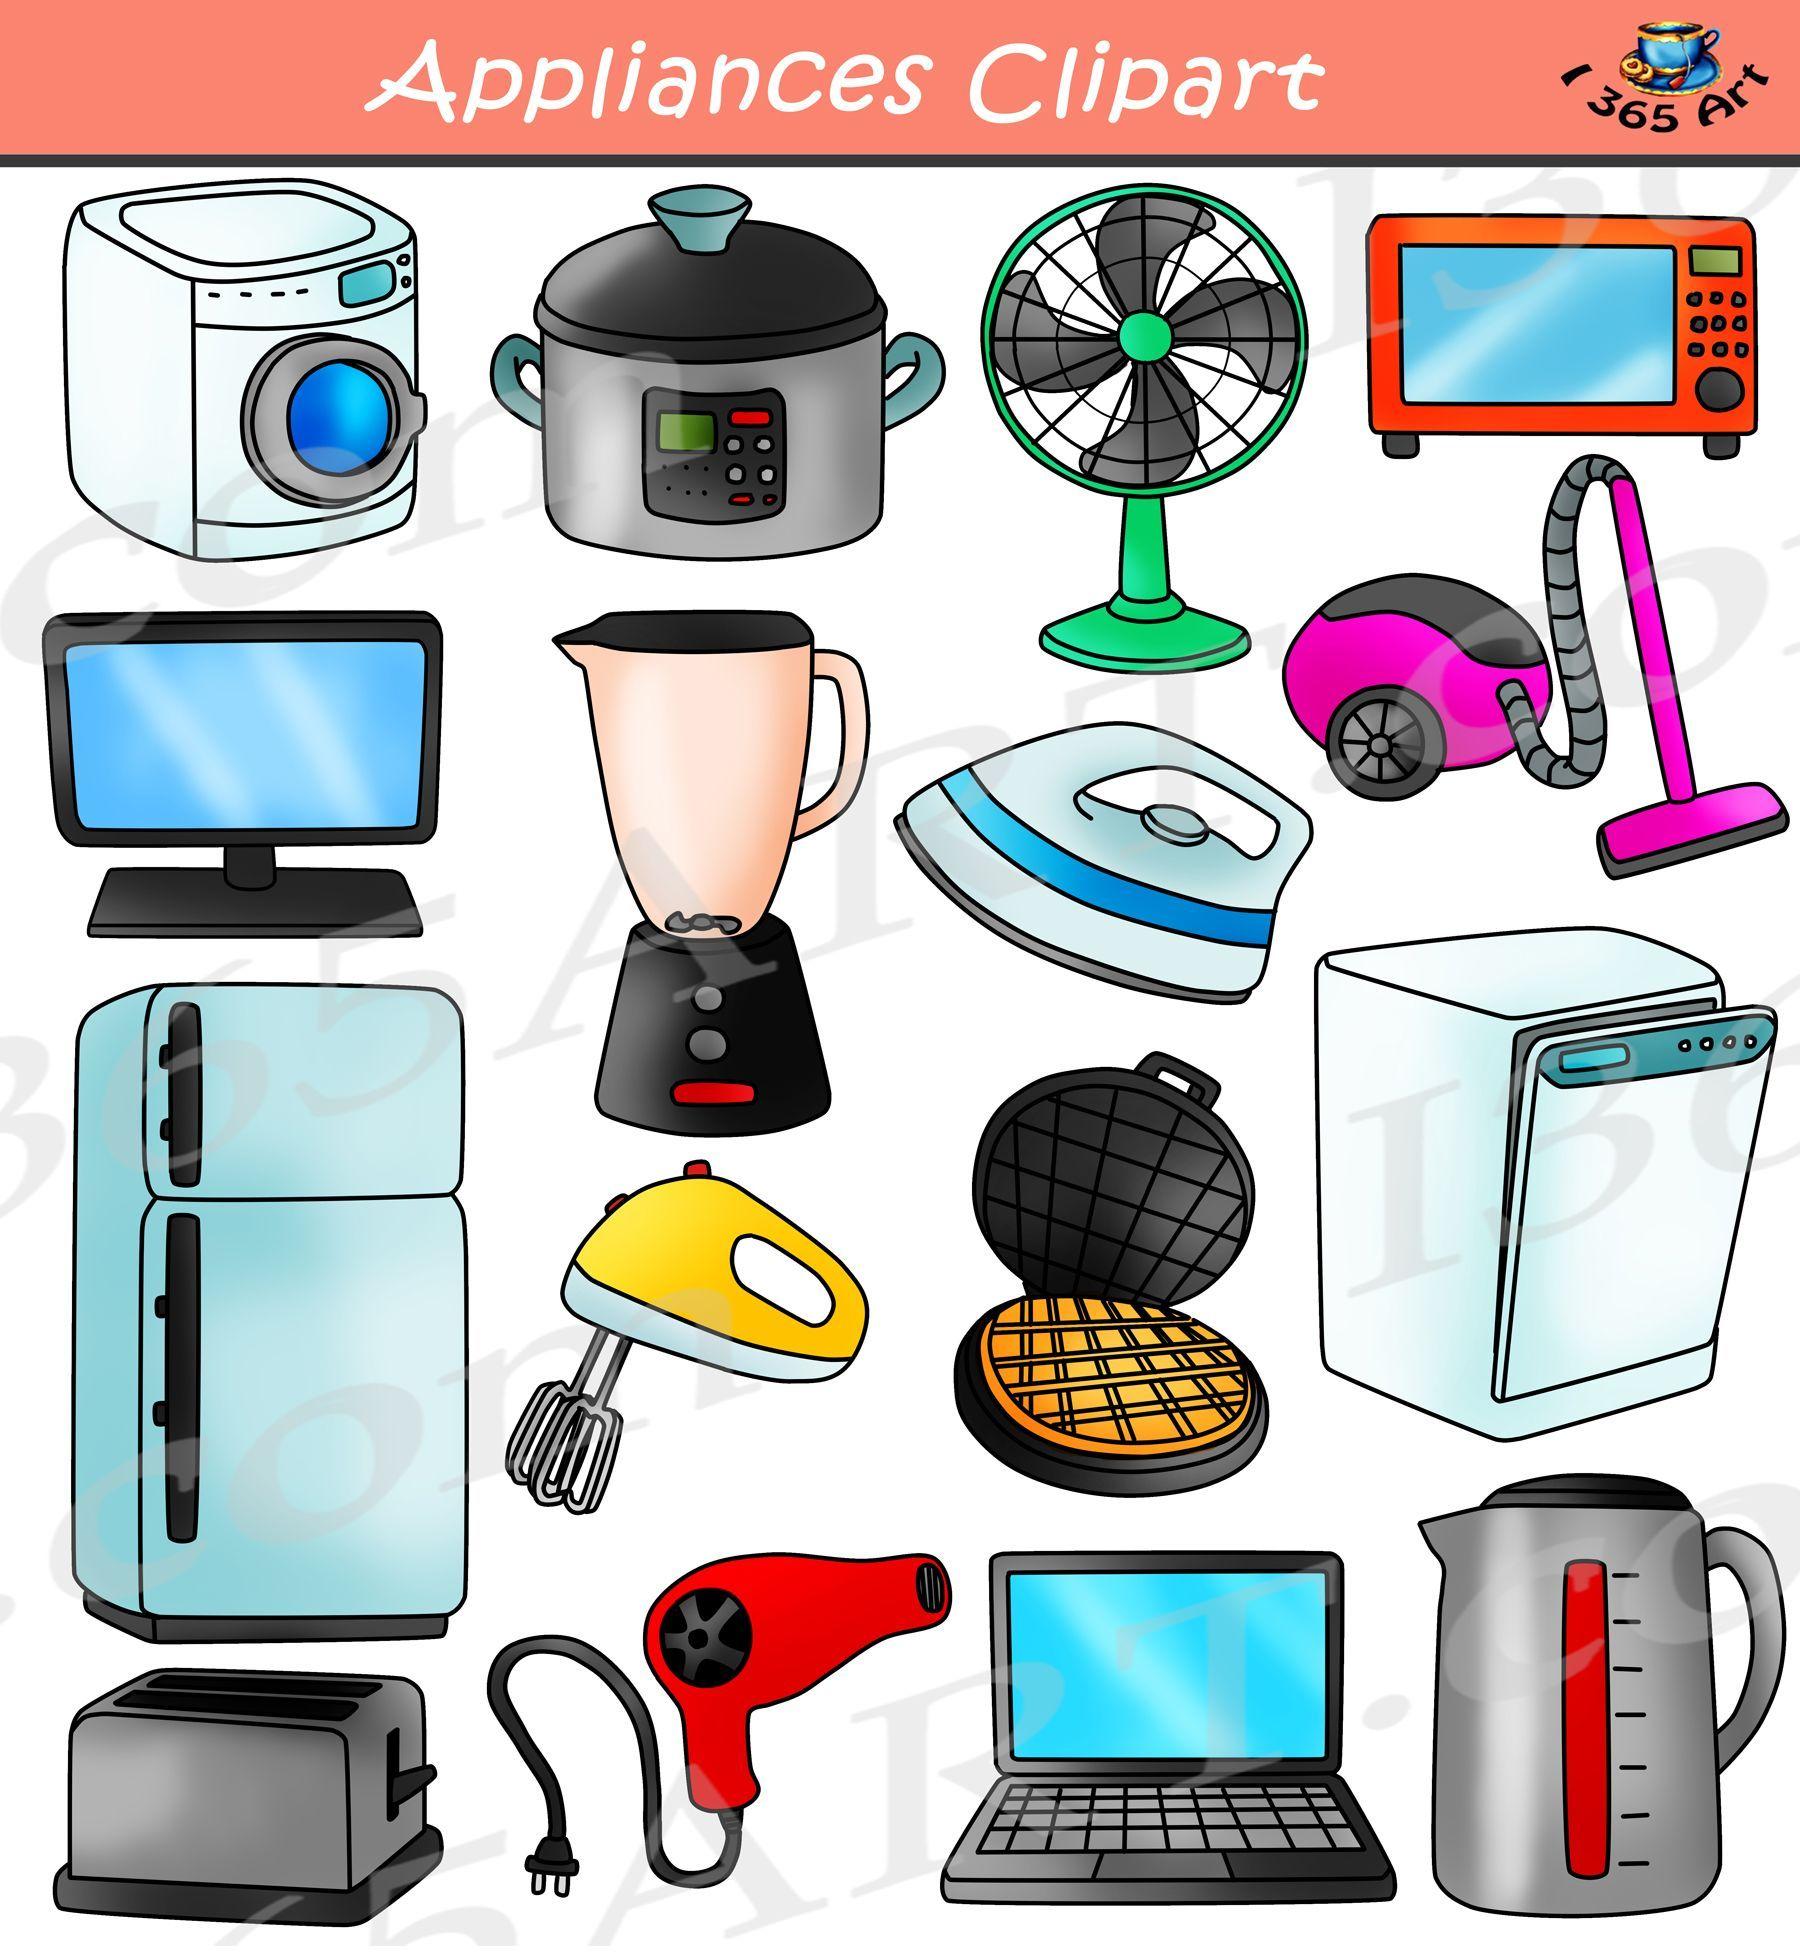 Electrical appliances clipart set digital download for